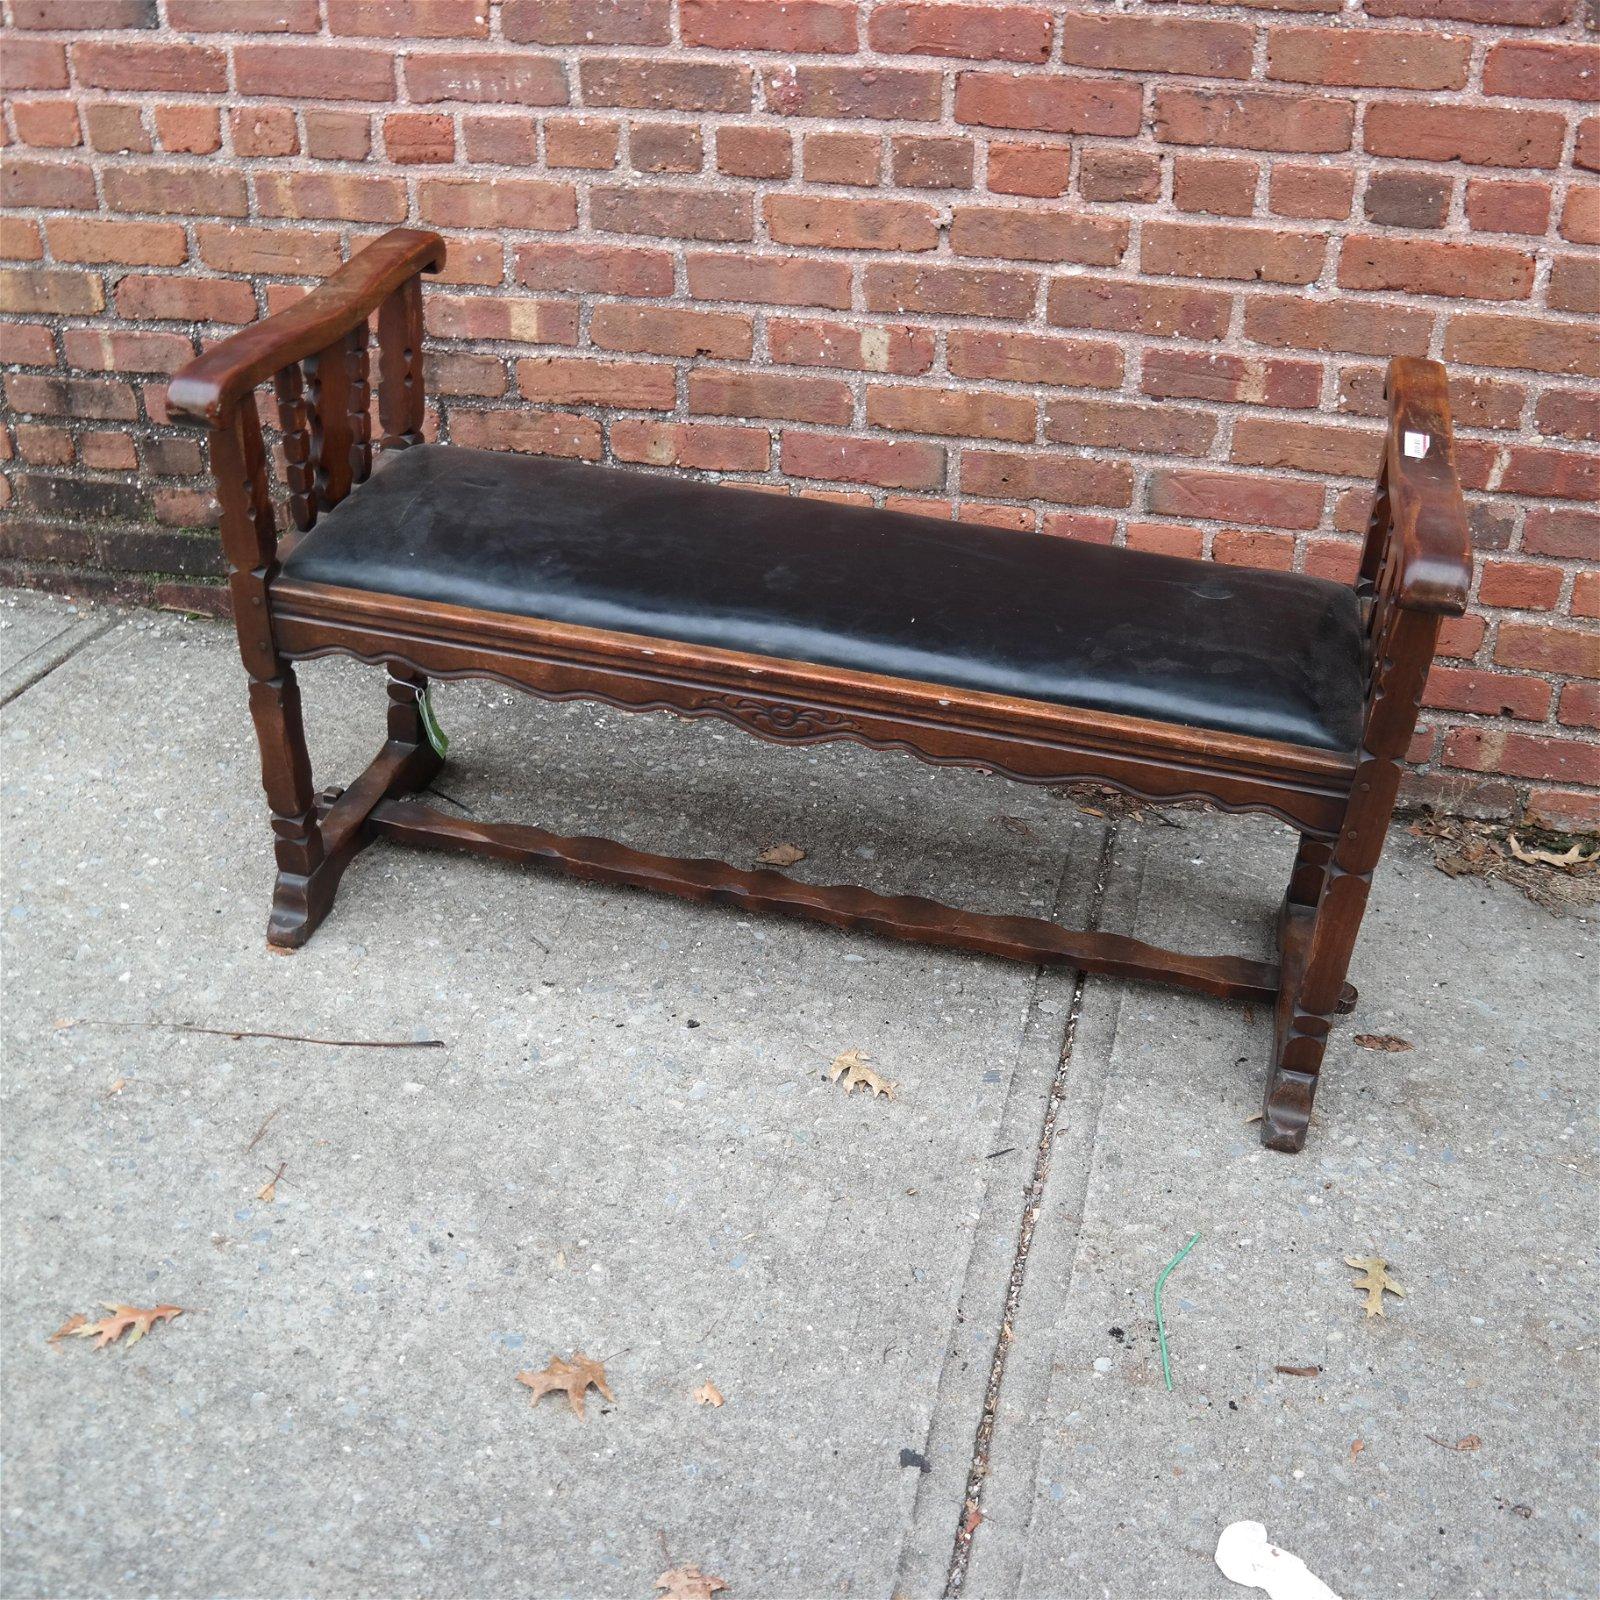 Tudor-Style Bench